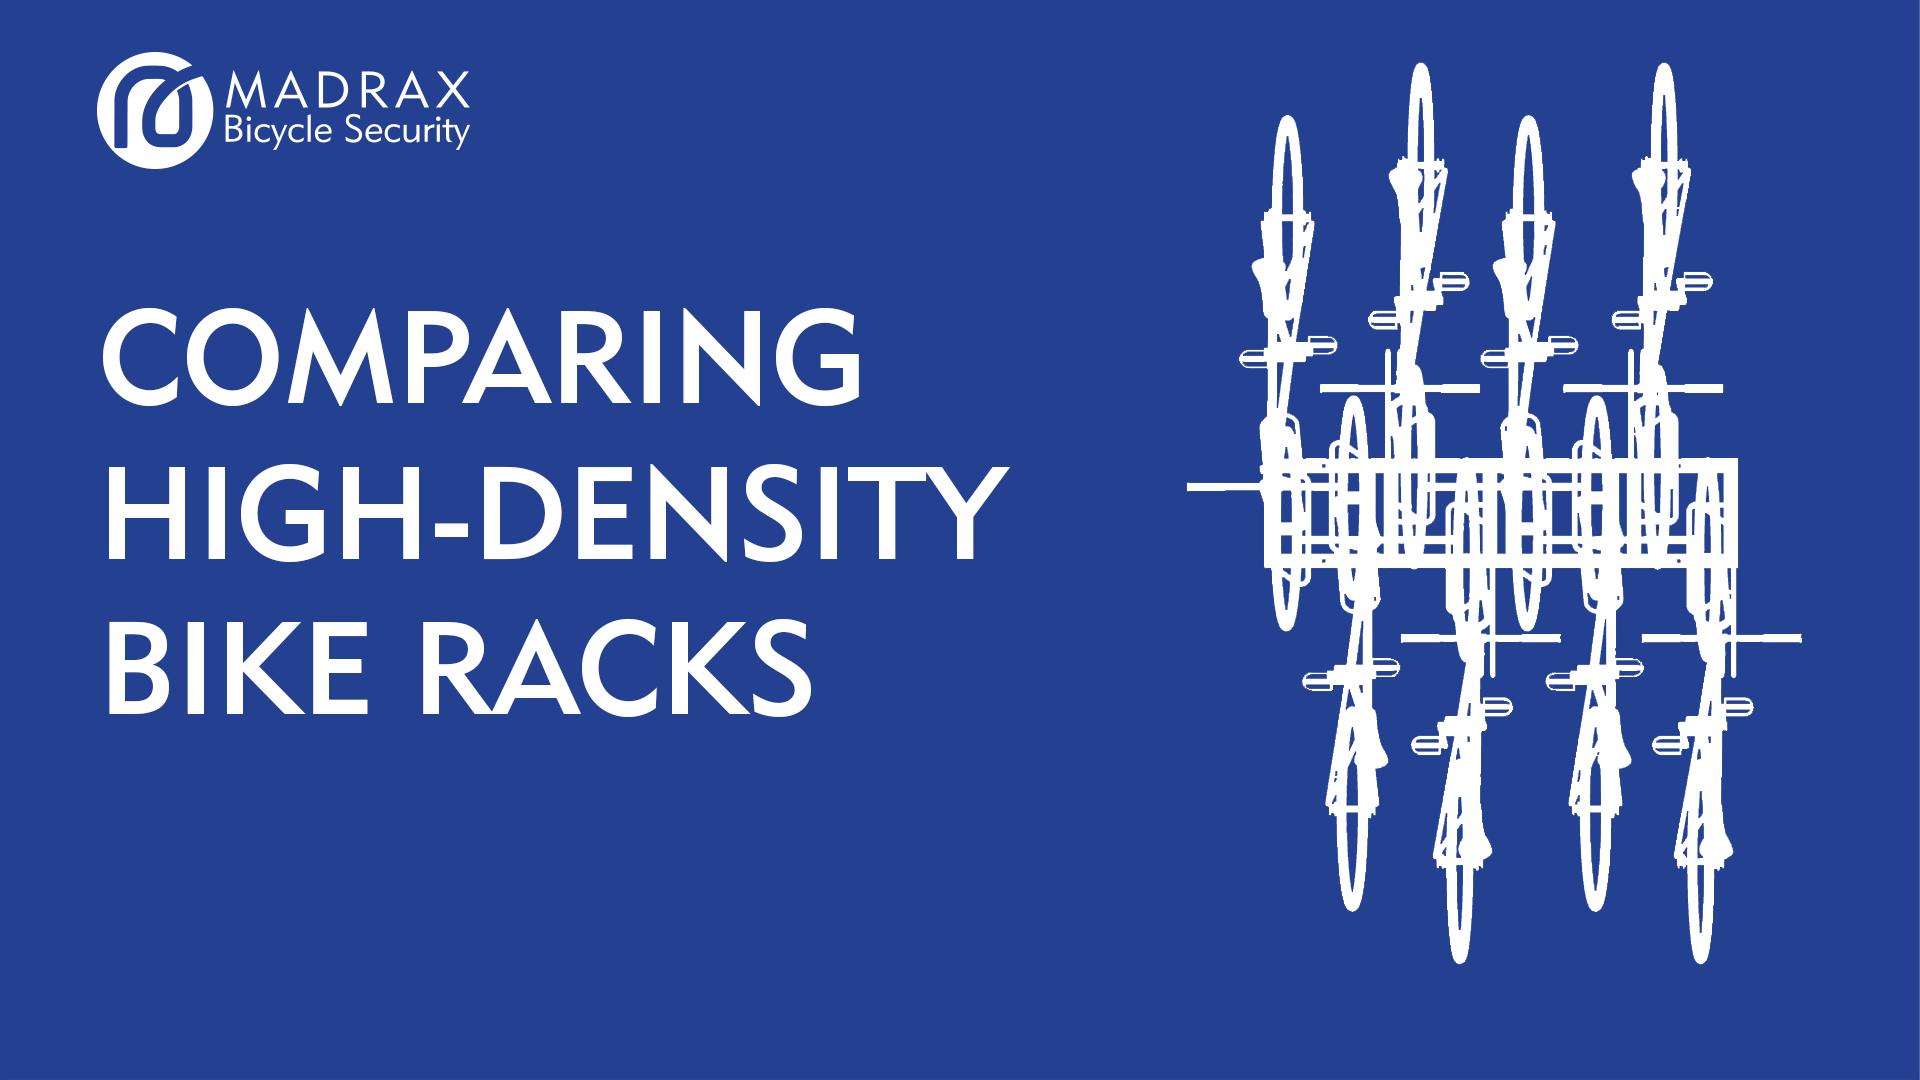 High Density Bike Rack Image and Title